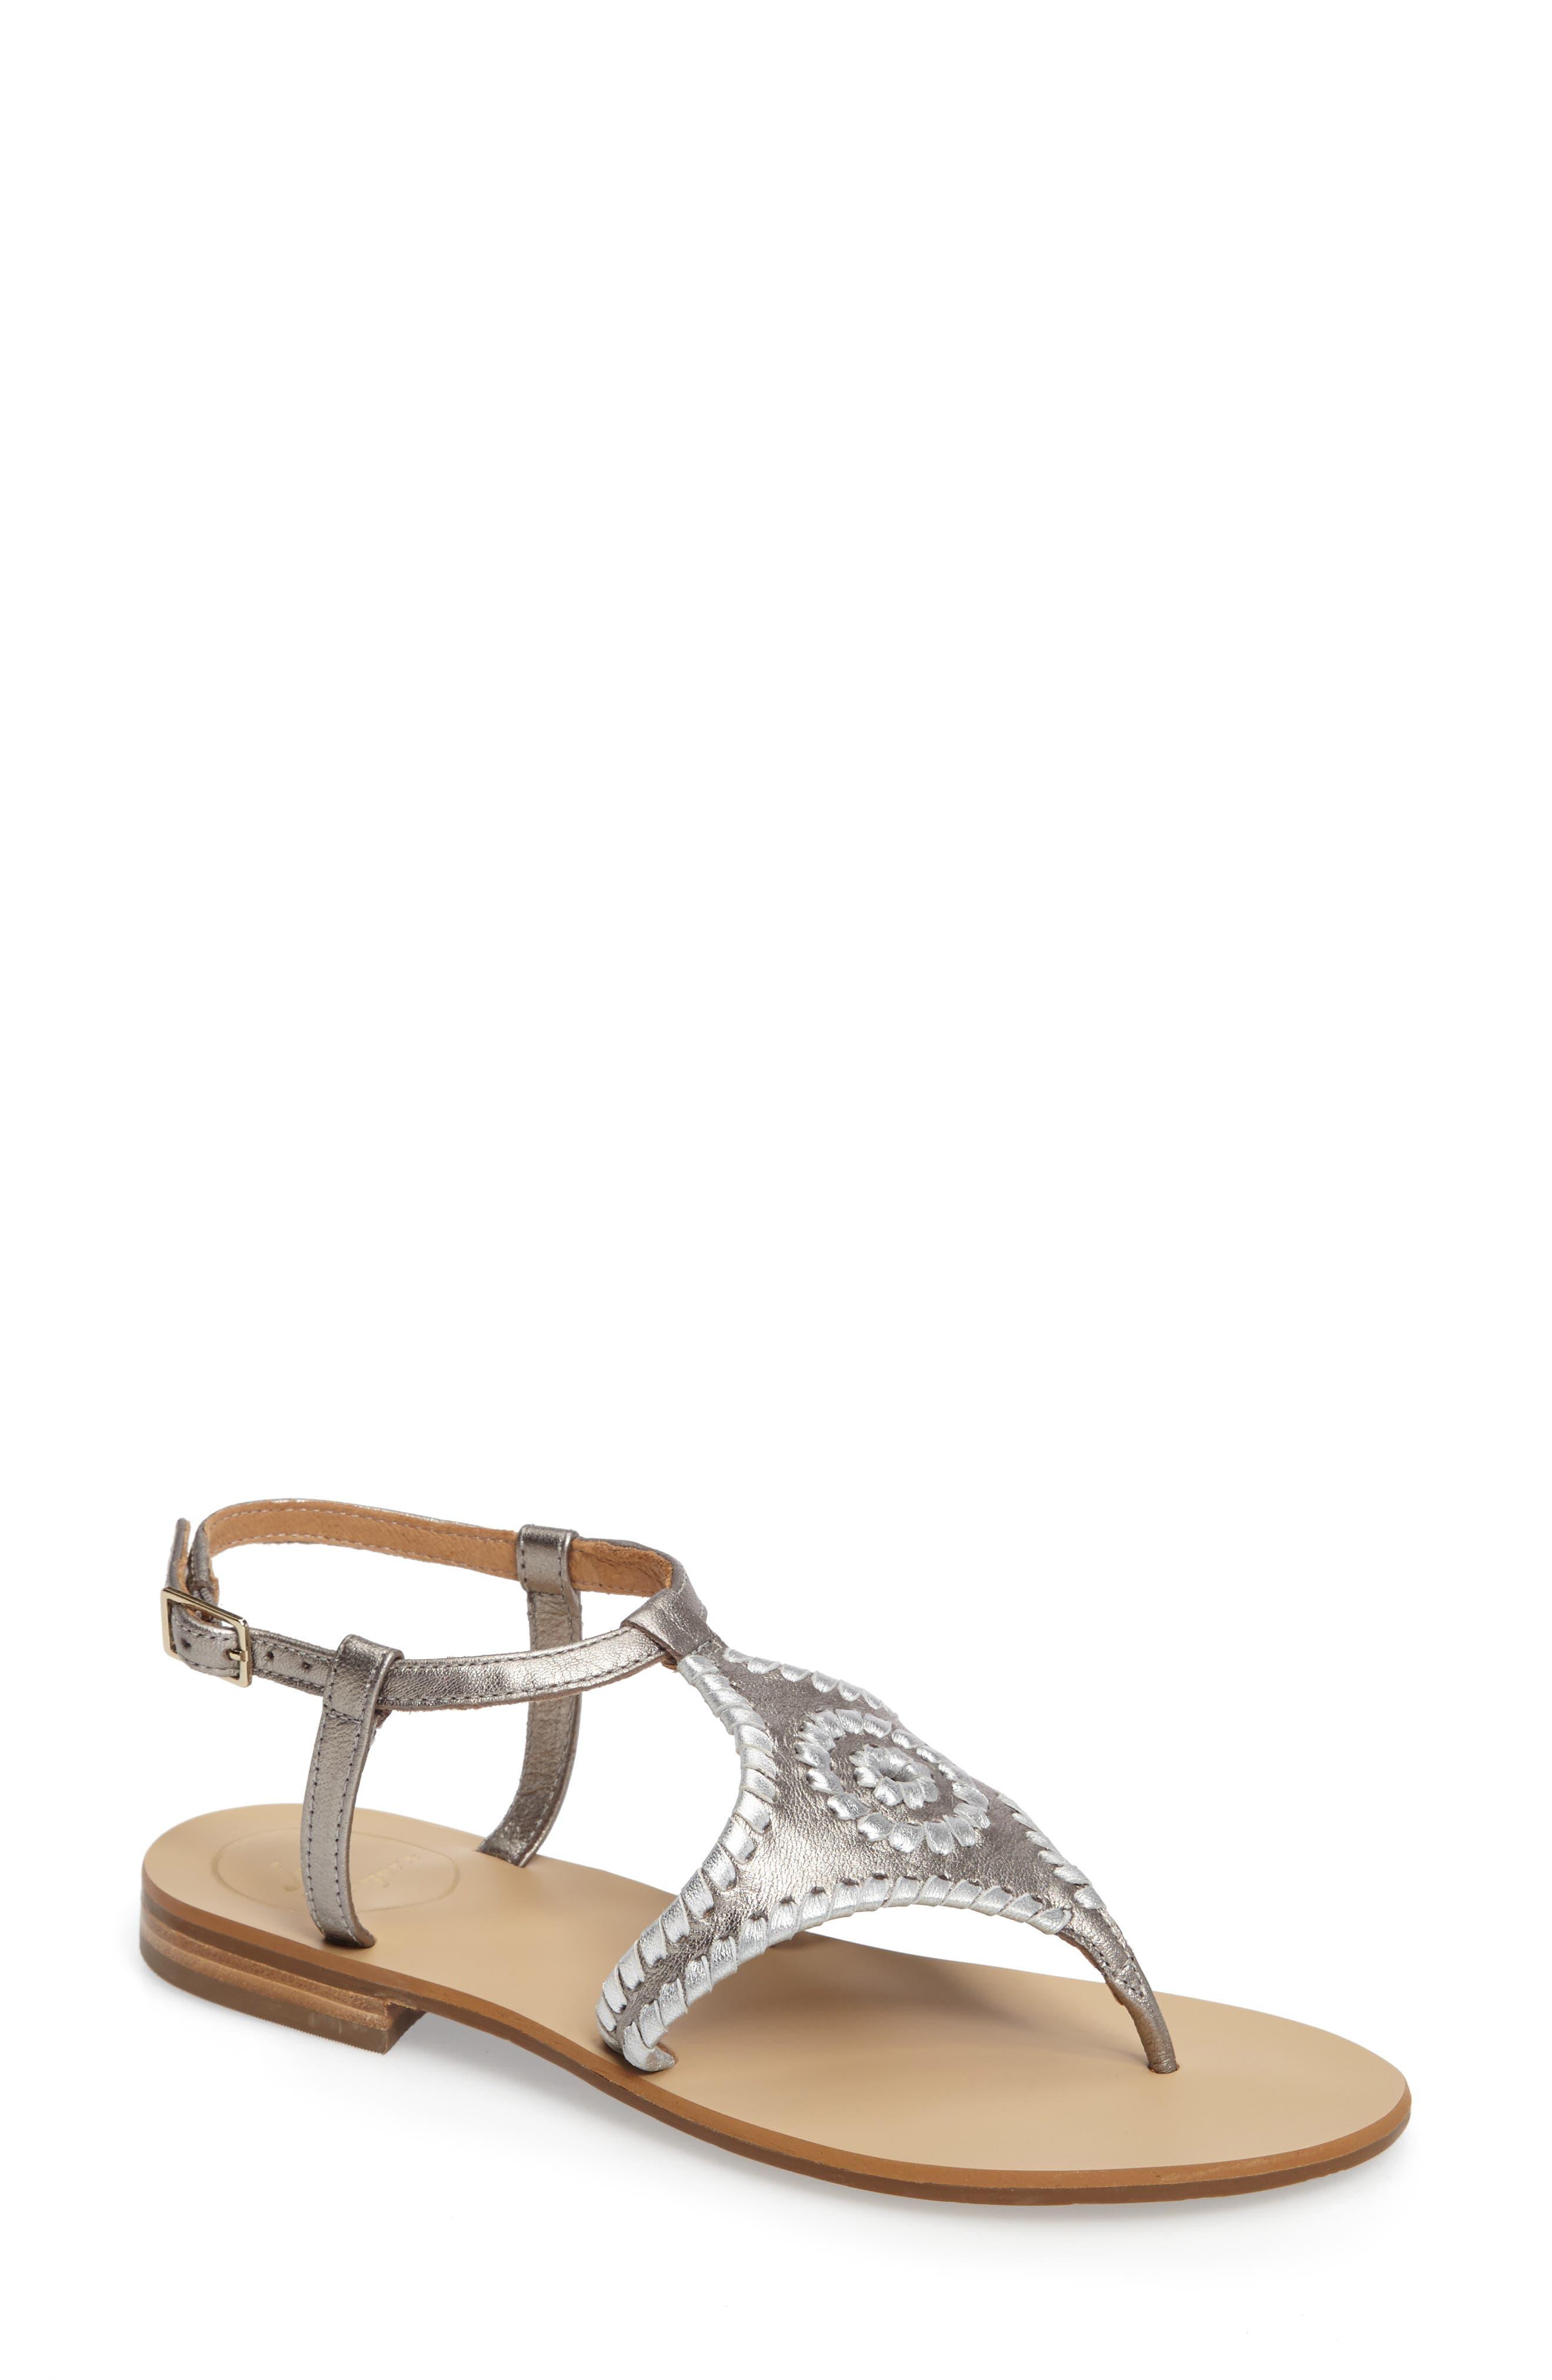 JACK ROGERS Maci Flat Sandal